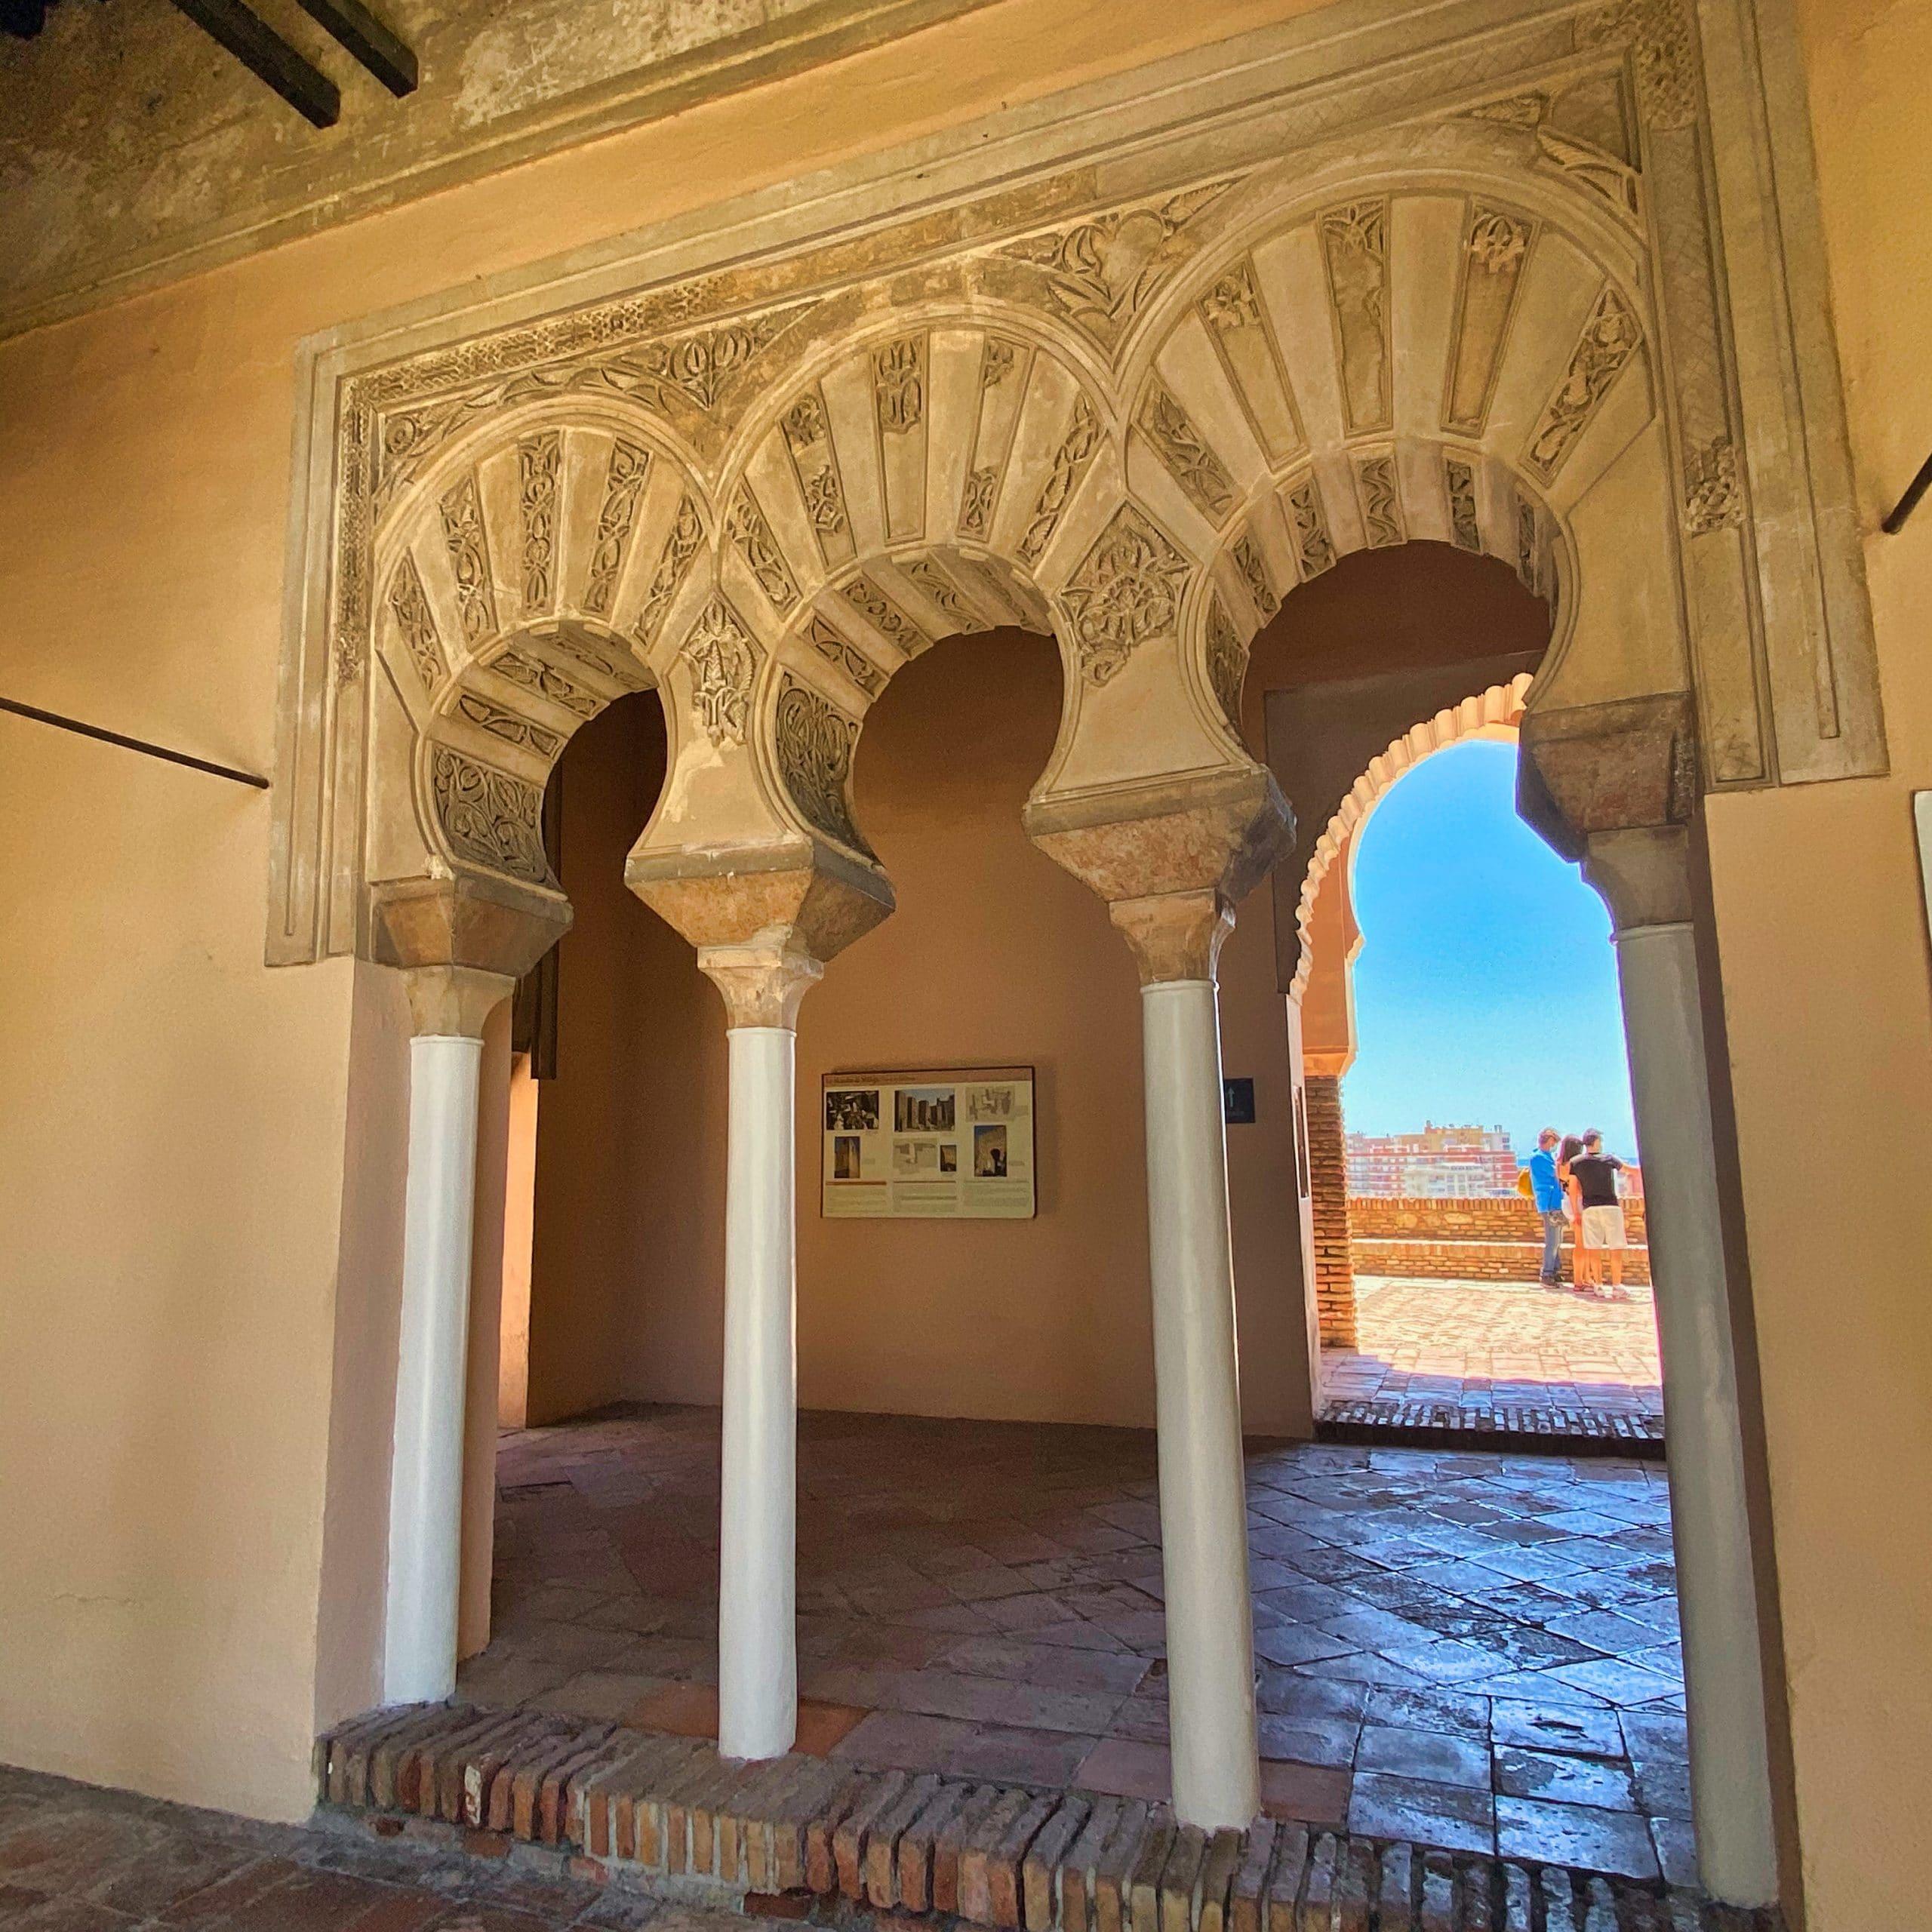 Moorish arches inside Alcazaba de Malaga